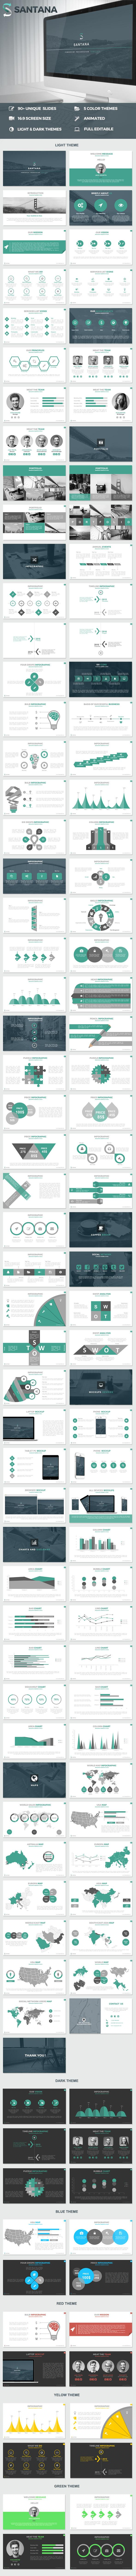 Santana_Powerpoint_Presentation_Template - PowerPoint Templates Presentation Templates